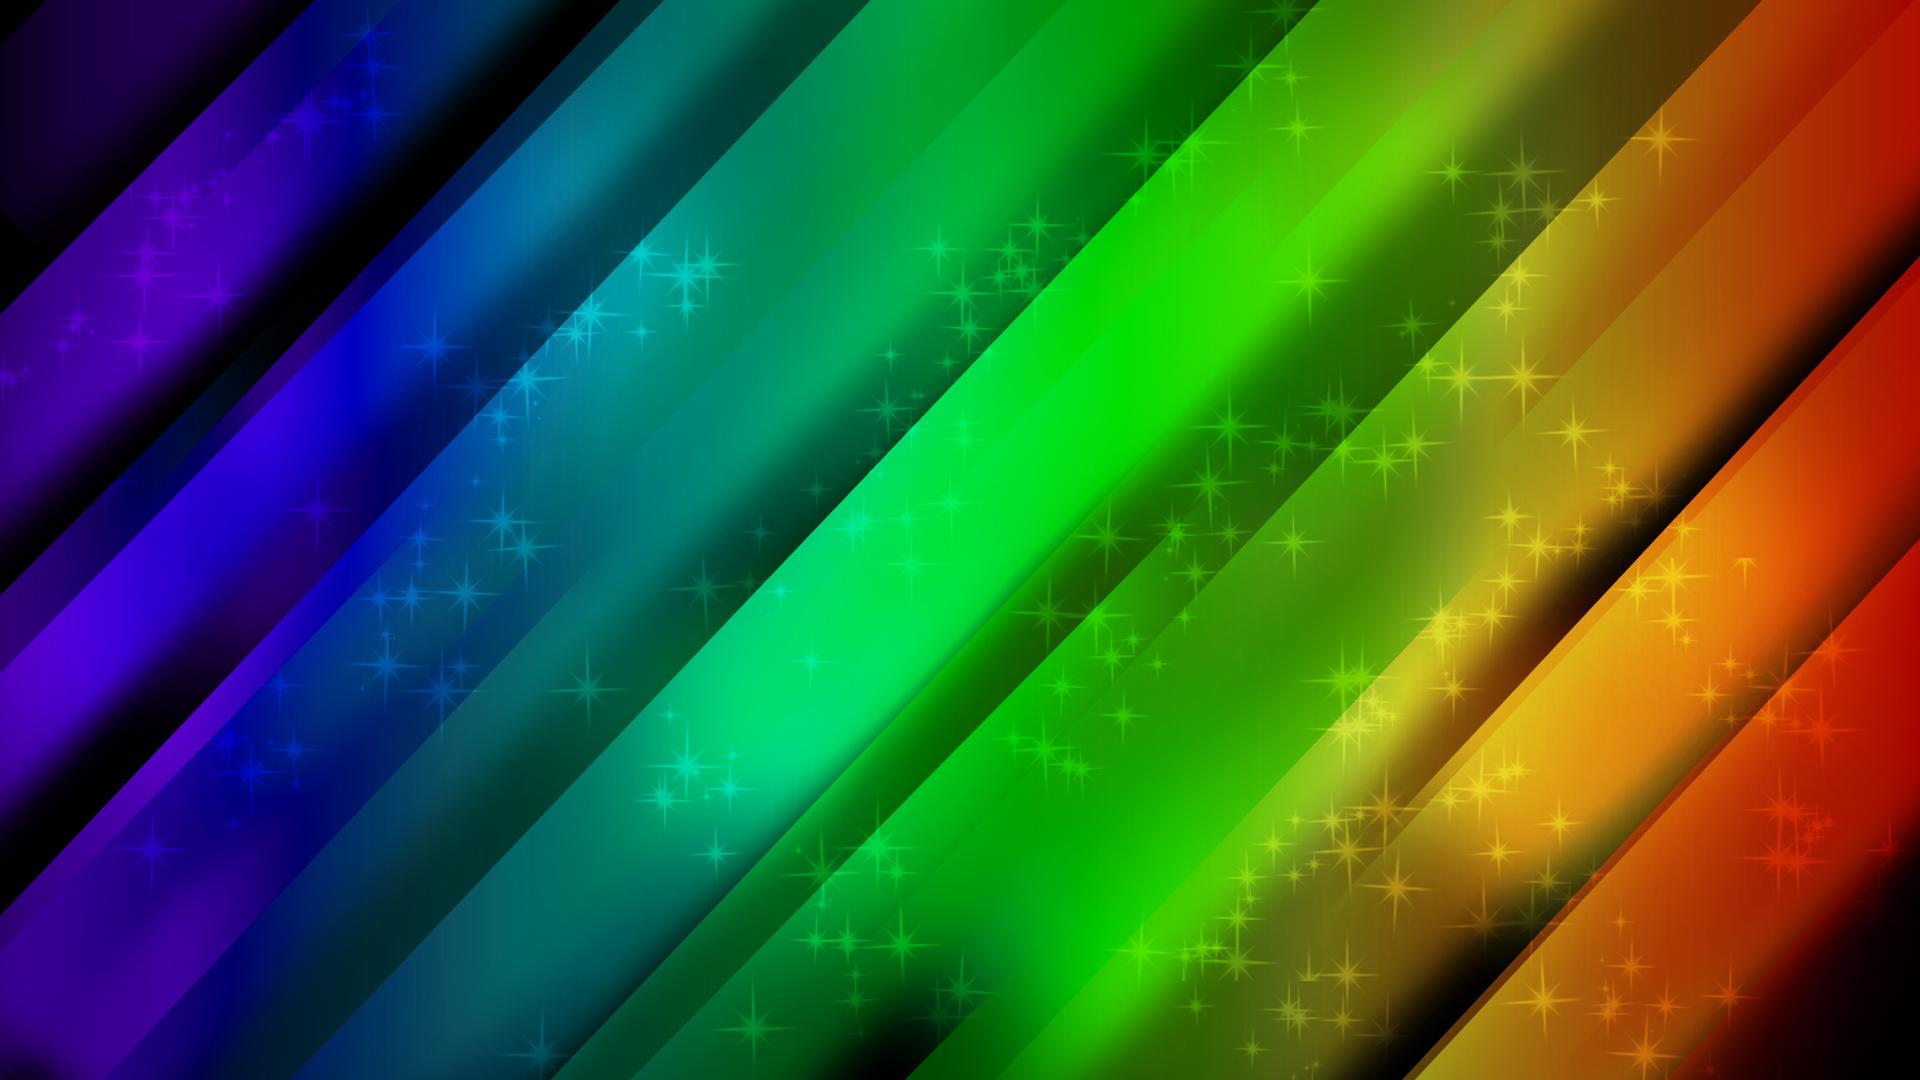 1920x1080 Colorful Wallpaper desktop PC and Mac wallpaper 1920x1080